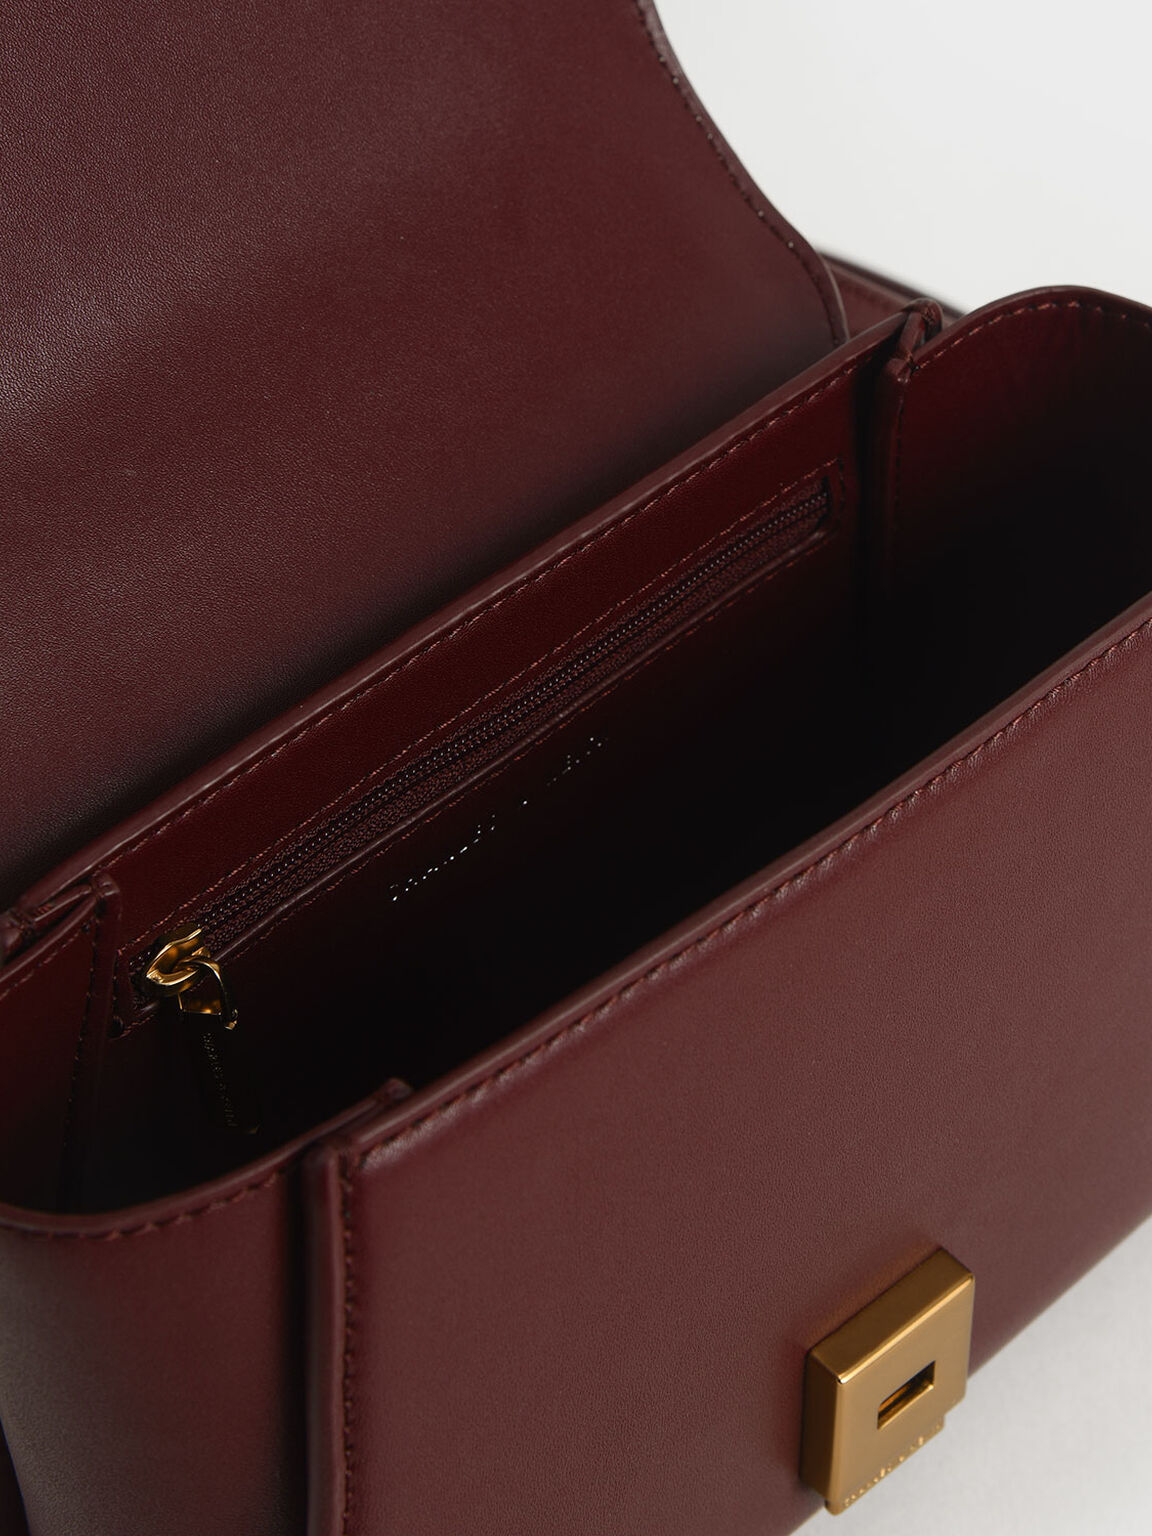 Metallic-Trimmed Front Flap Bag, Prune, hi-res